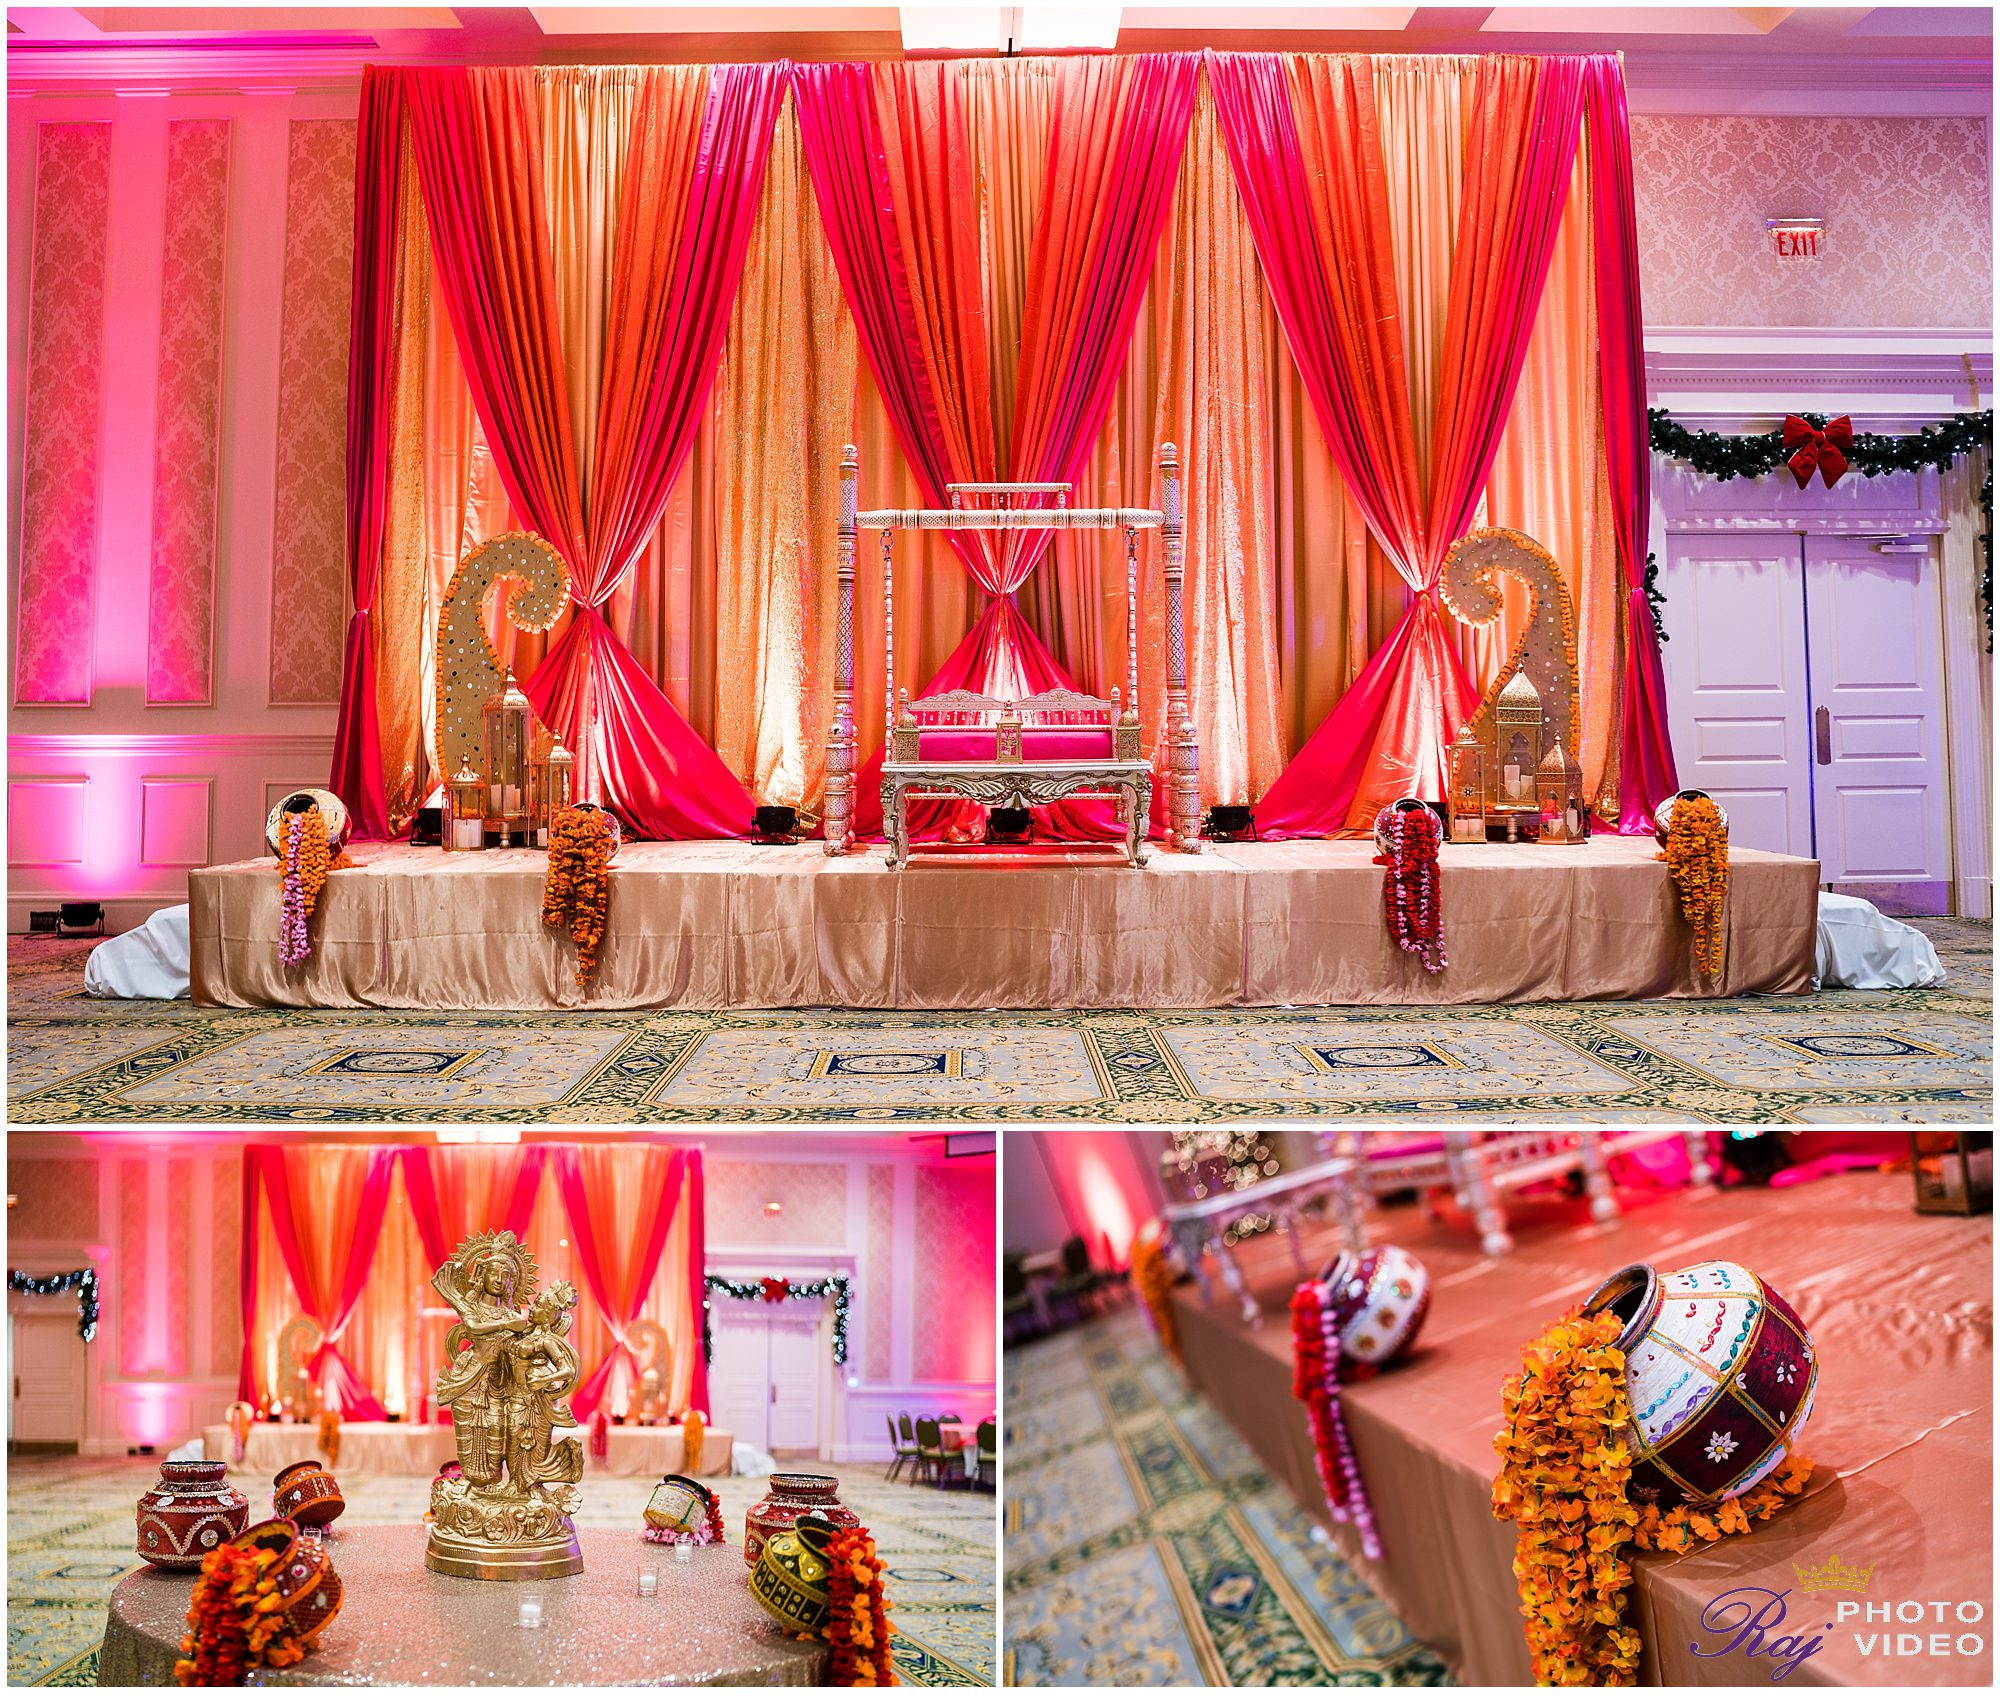 Founders-Inn-and-Spa-Virginia-Beach-VA-Indian-Wedding-Harini-Vivek-5.jpg